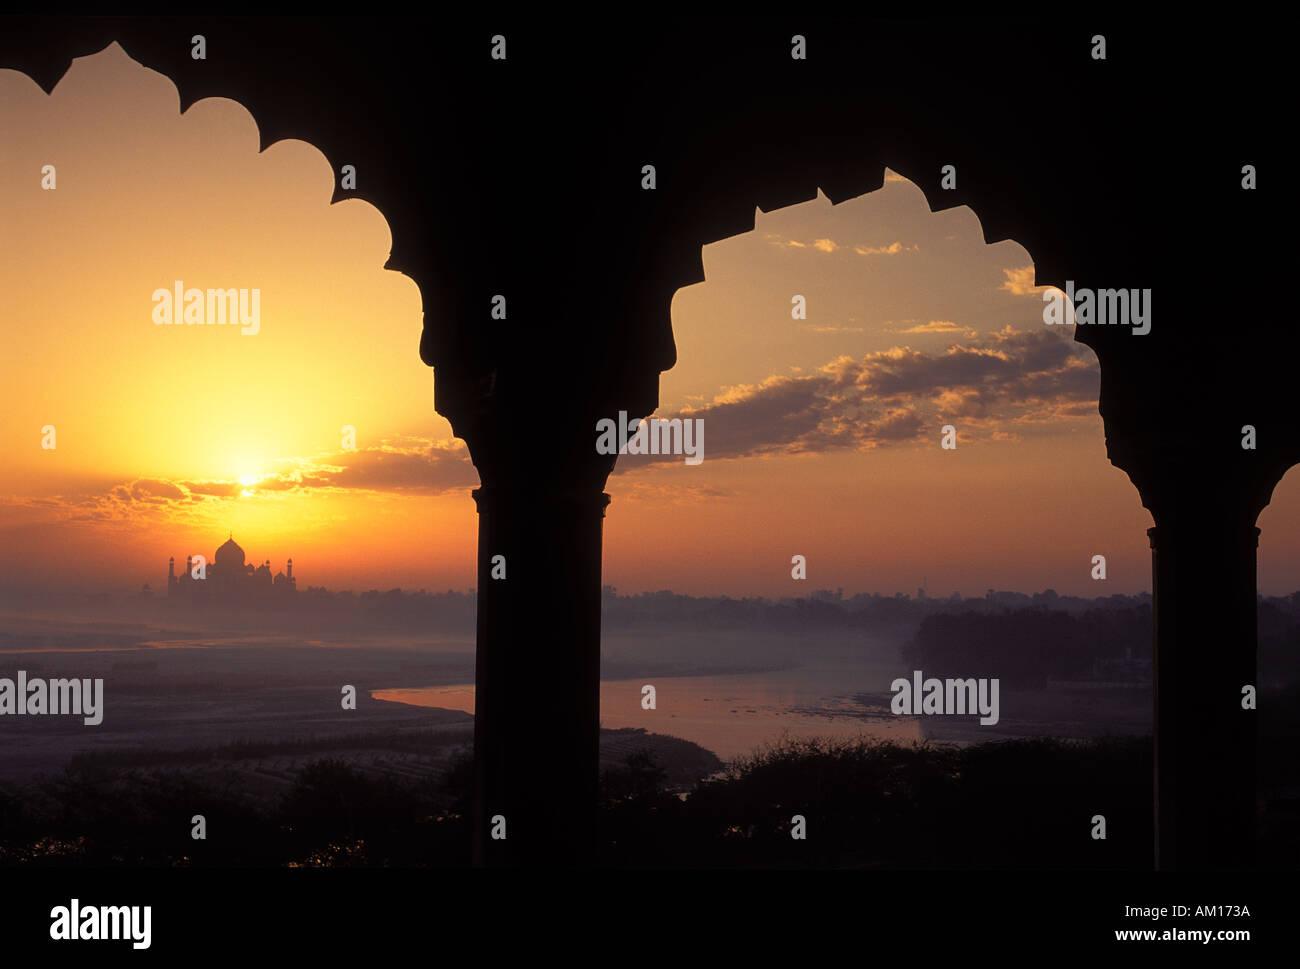 Amanecer en el Taj Mahal de Agra Fort Agra India Foto de stock